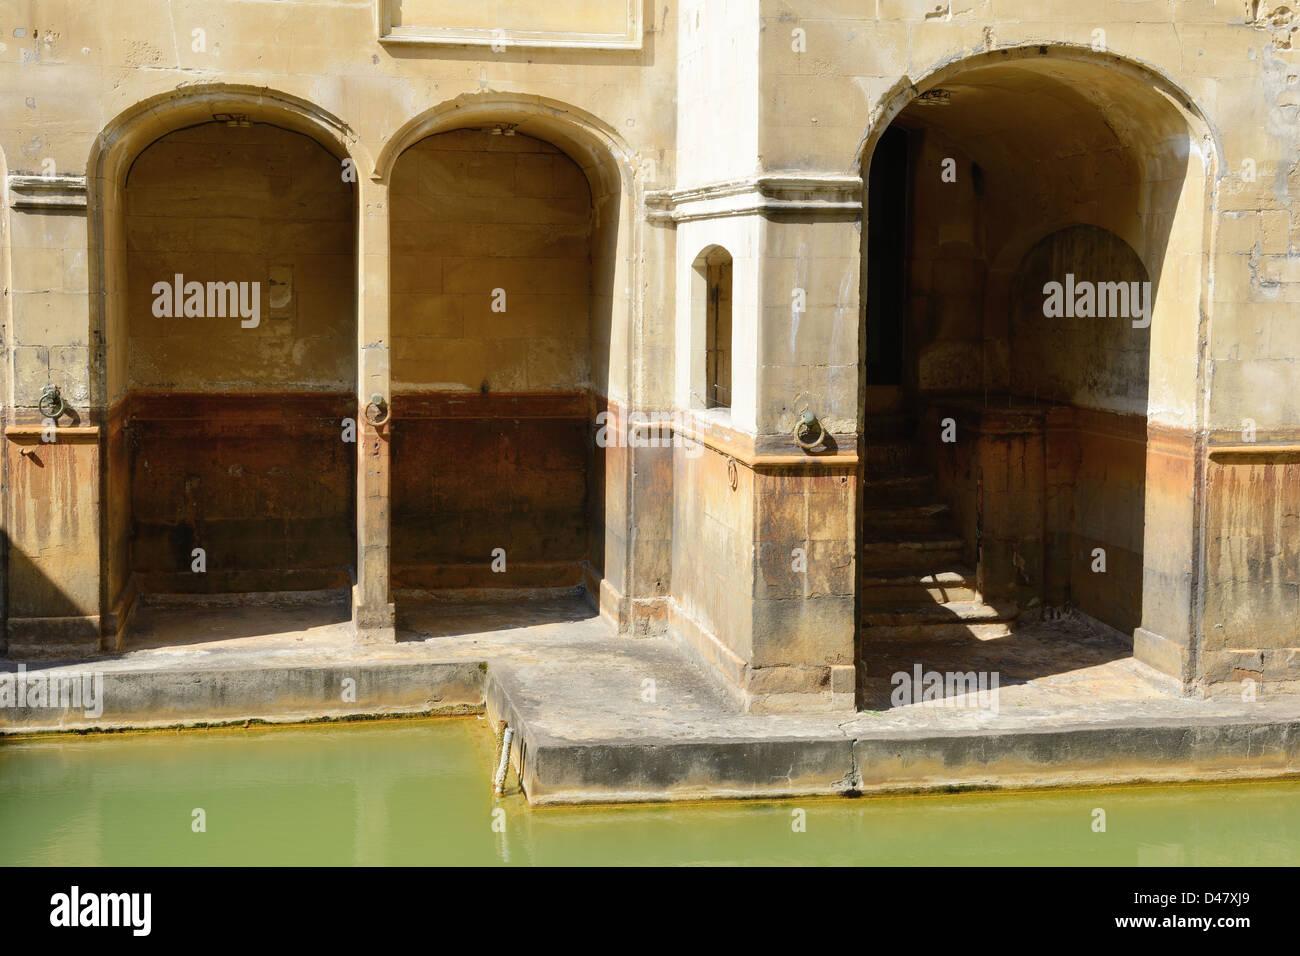 The Roman Baths - Bath, England - Stock Image